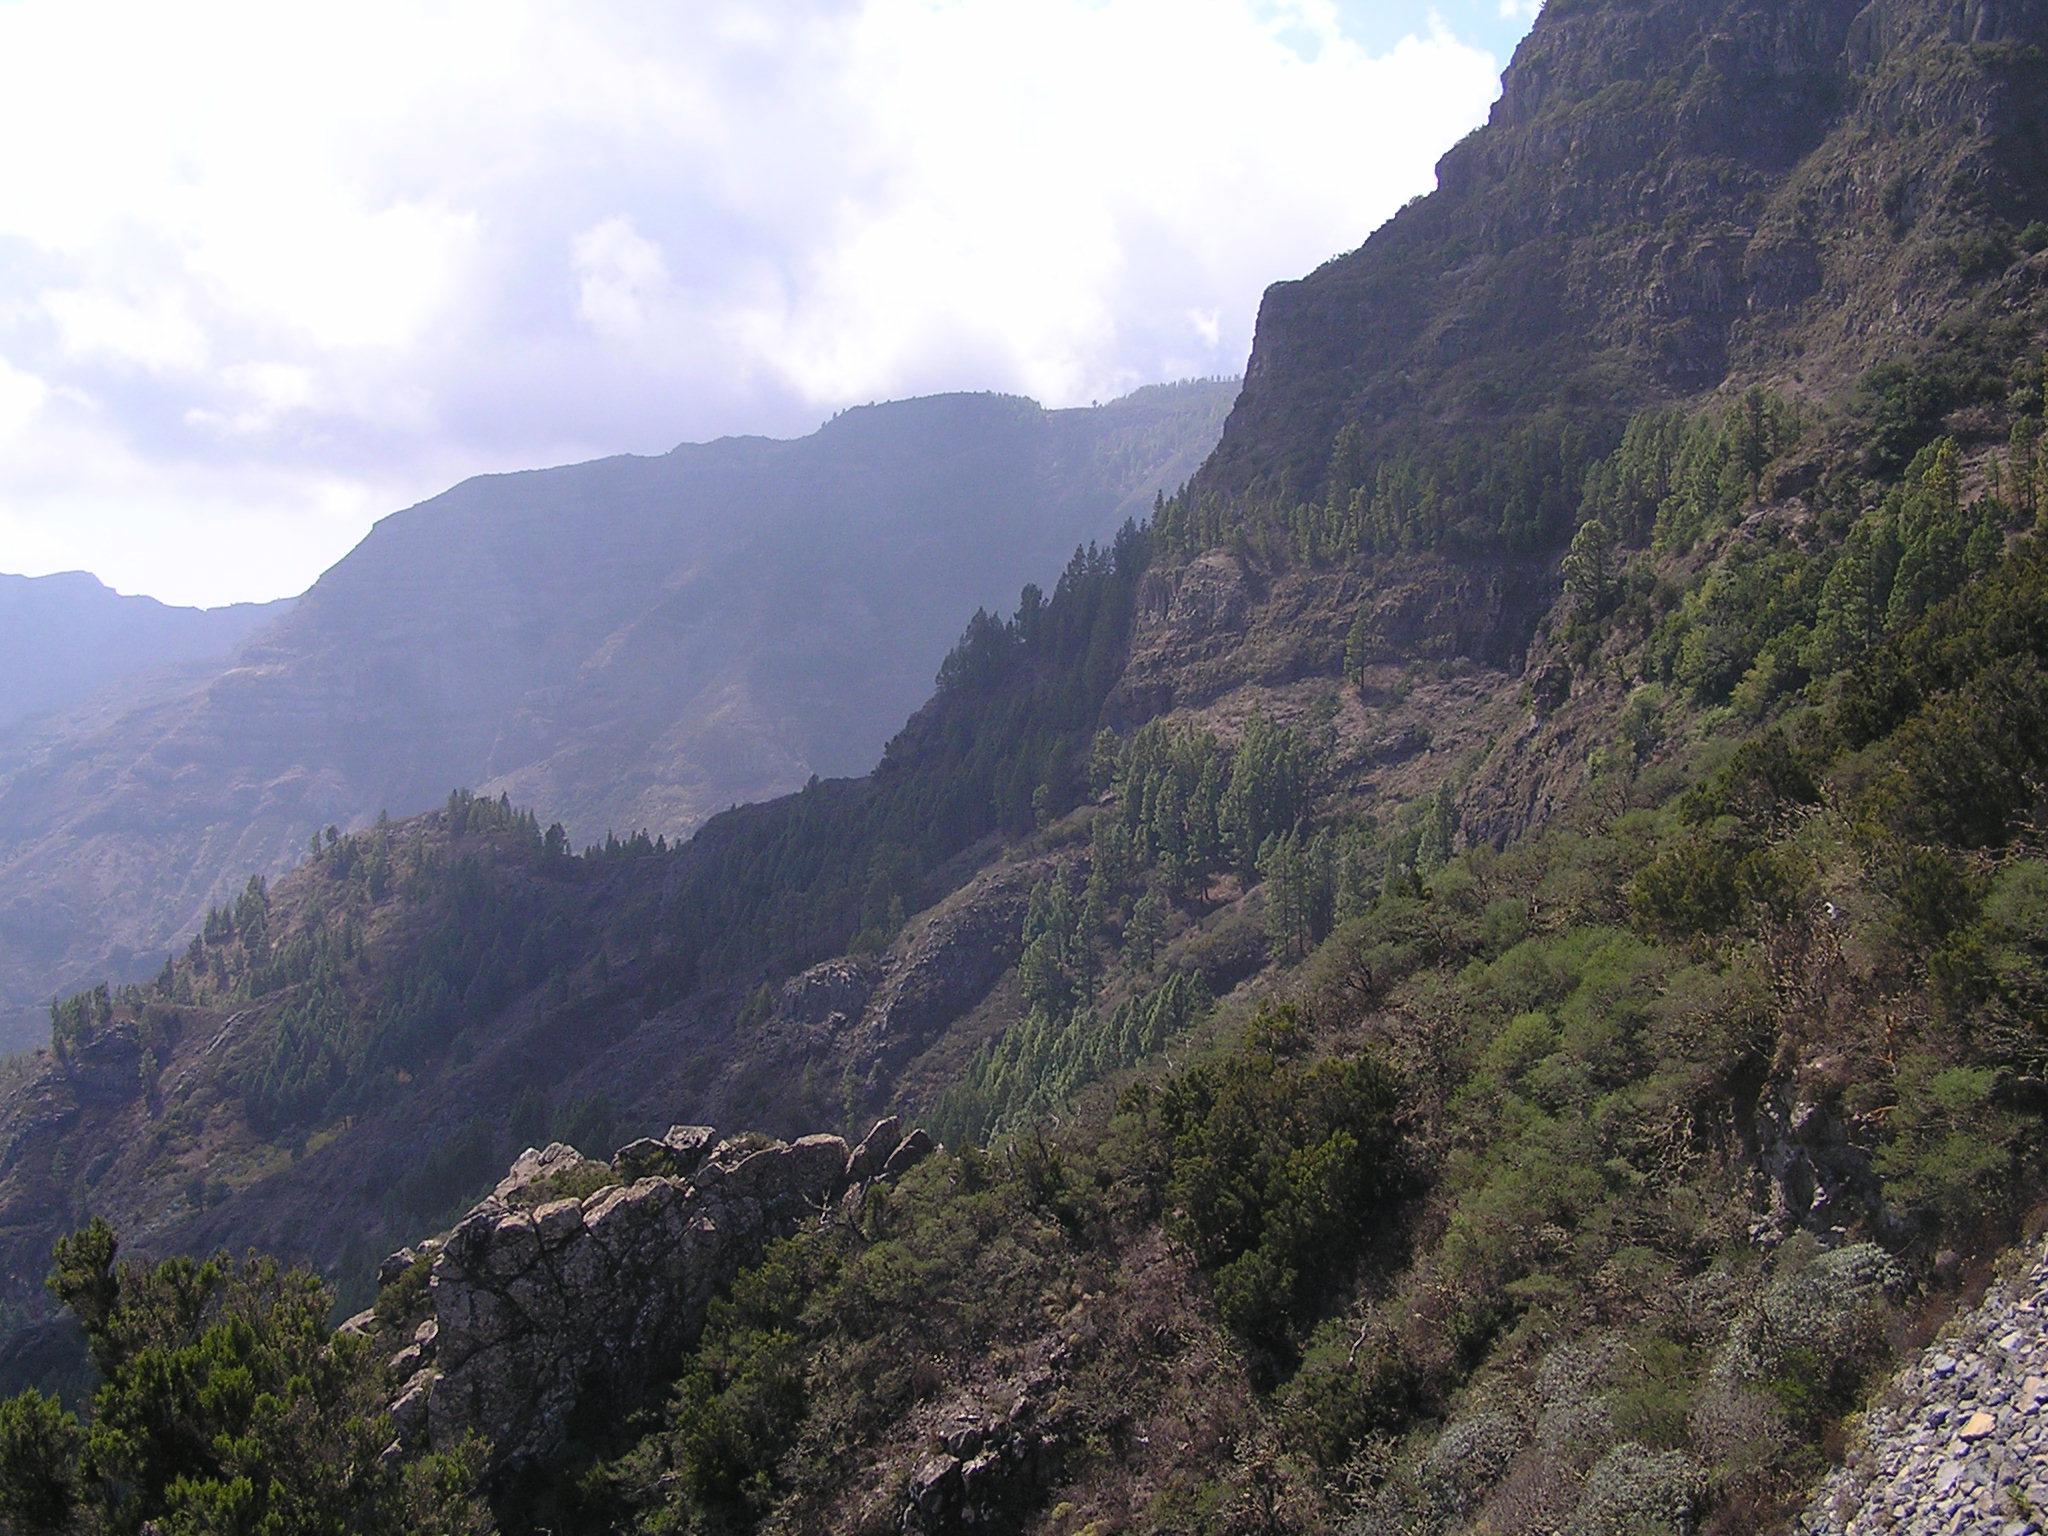 Garajonay National Park, La Gomera